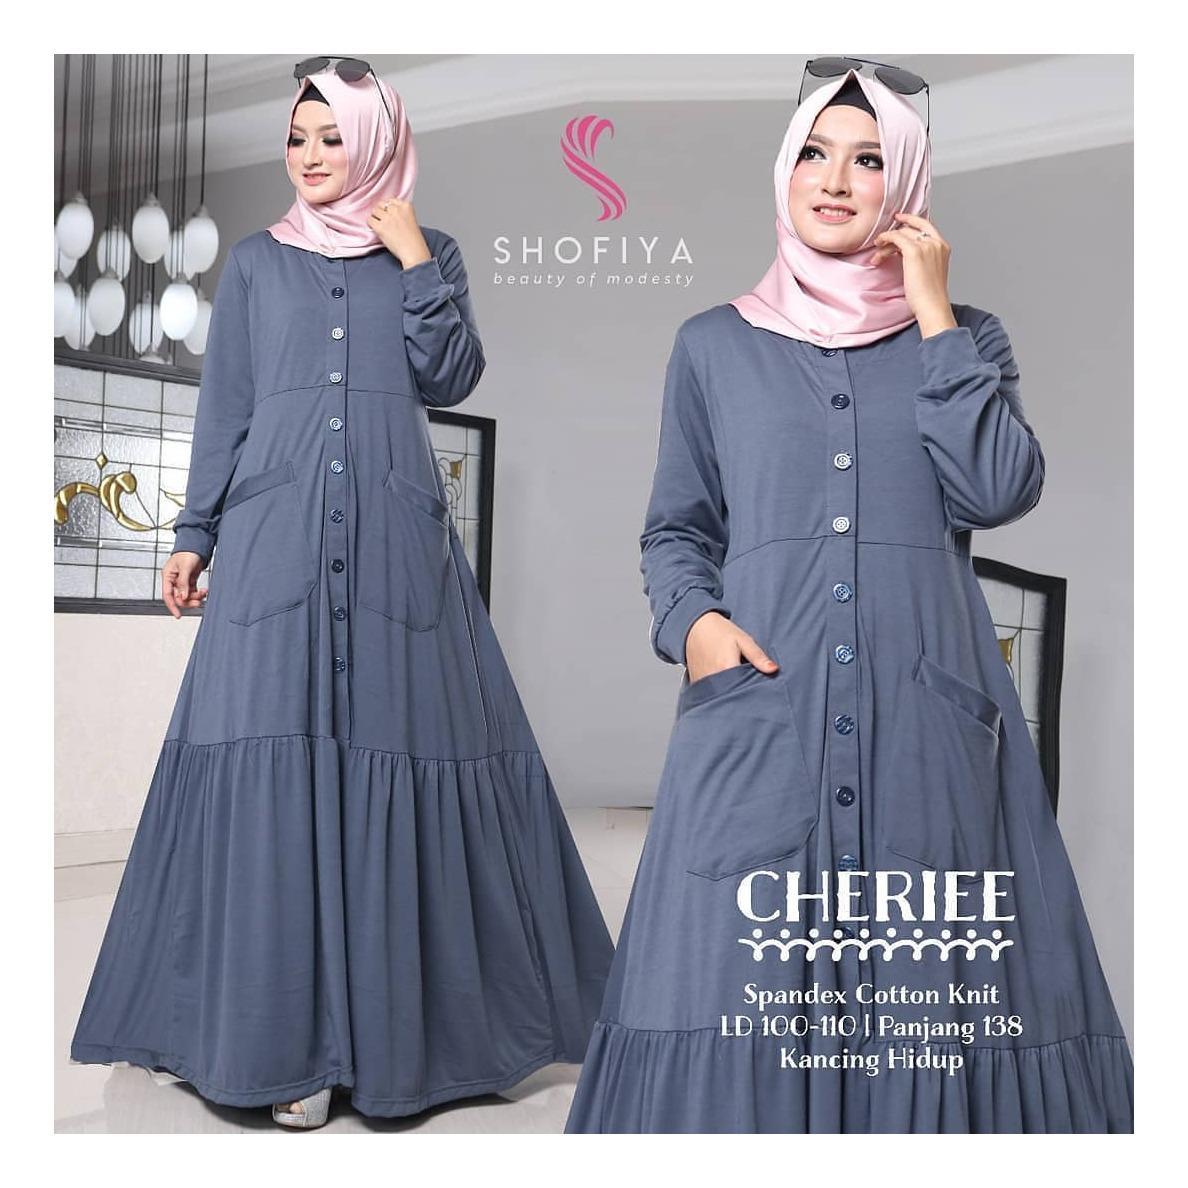 Baju Cheriee Dress Panjang Balotelly Hijab Casual Pakaian Muslim Wanita Muslim Modern Terbaru Termurah 2018